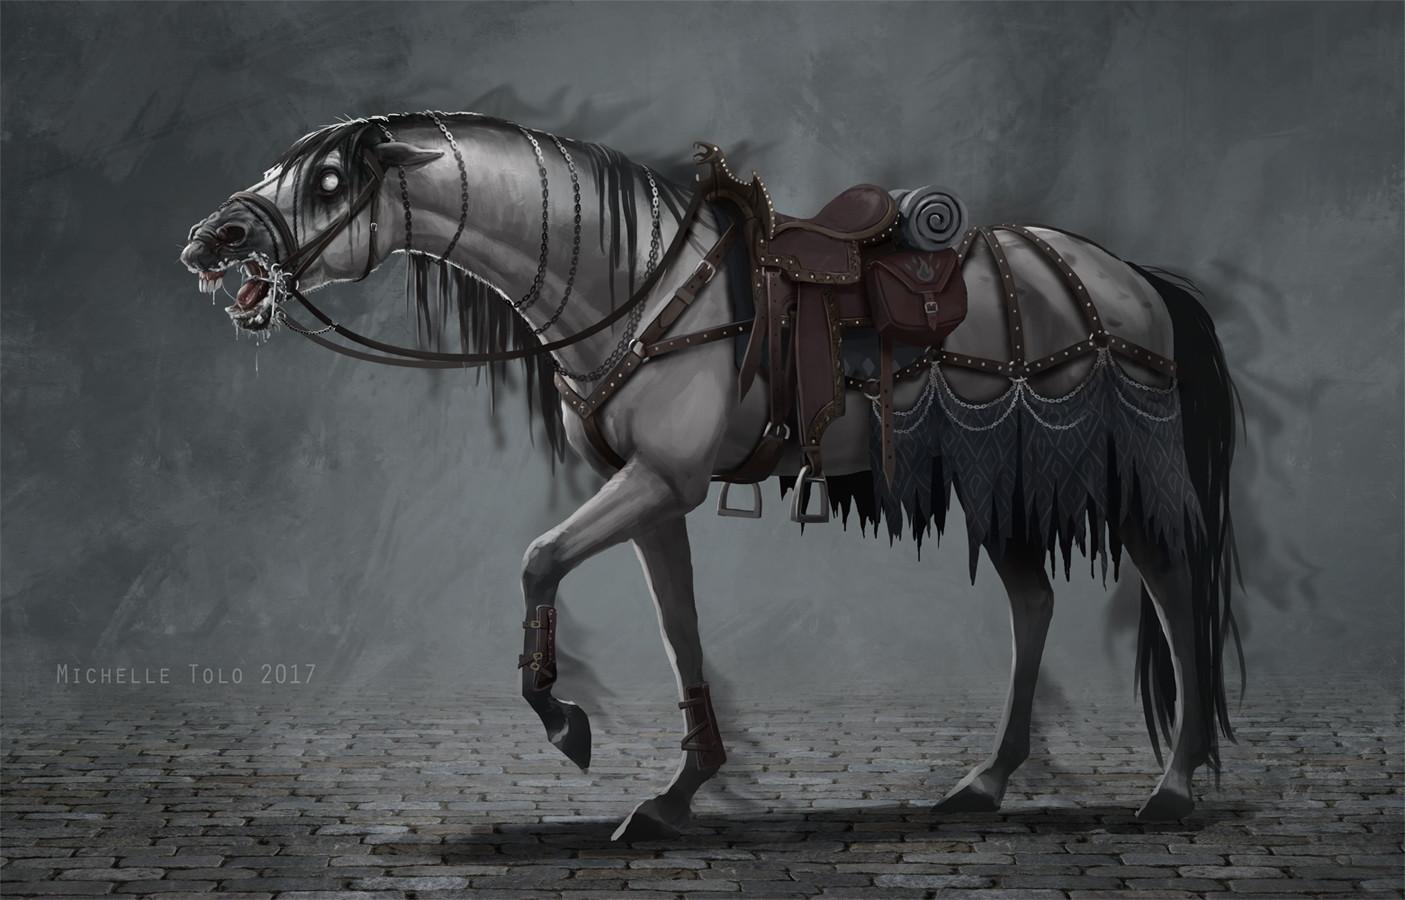 Nightmare saddled